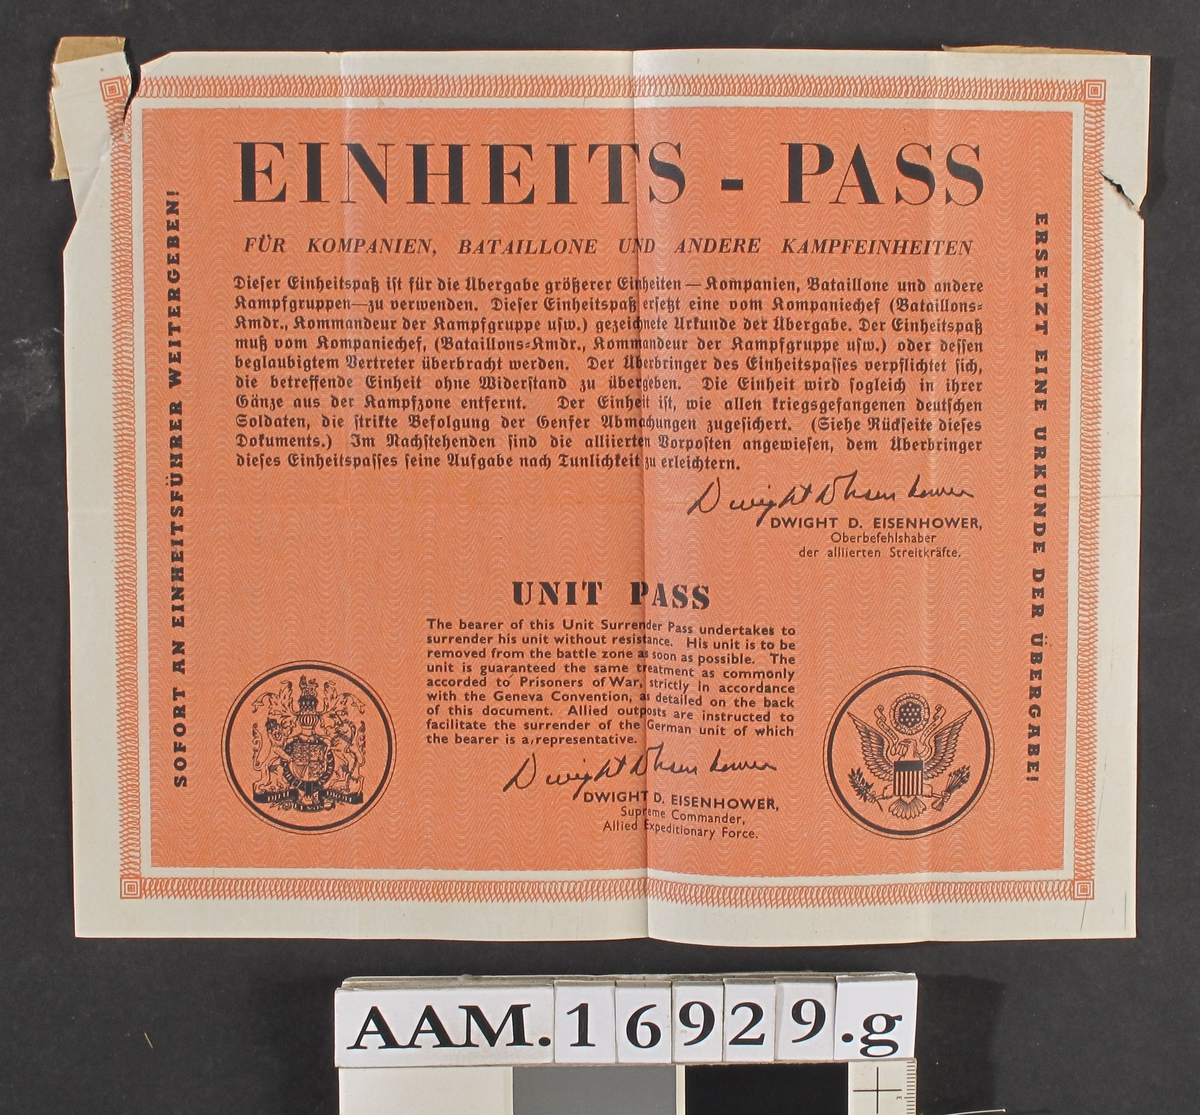 Einheits Pass, sort trykk på rødorarisje bunn ,sign.  Dwight D. Eisenhower, udat.(antag. 1945).